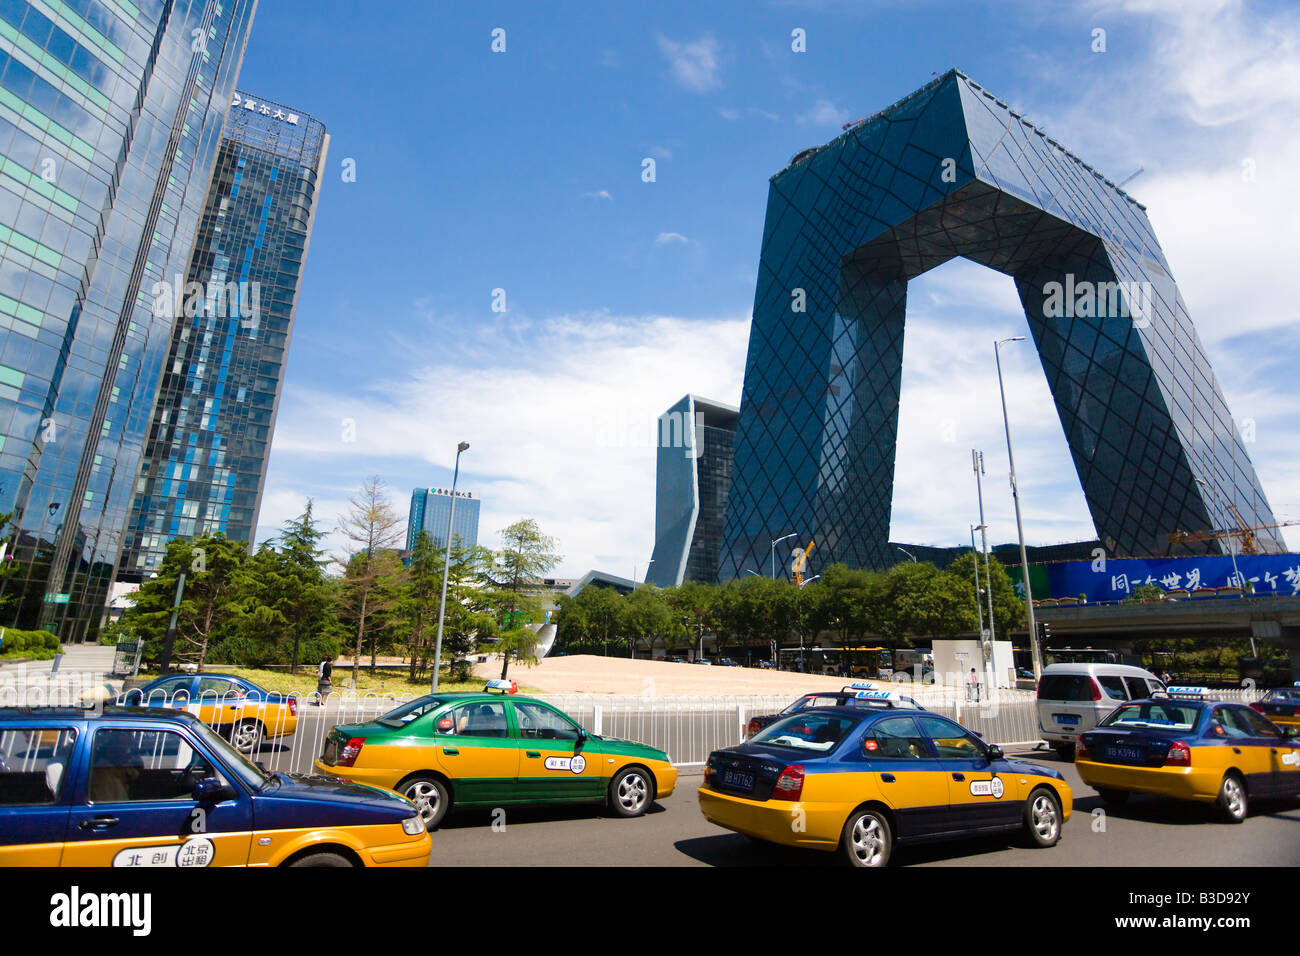 CCTV Headquarters Beijing China - Stock Image